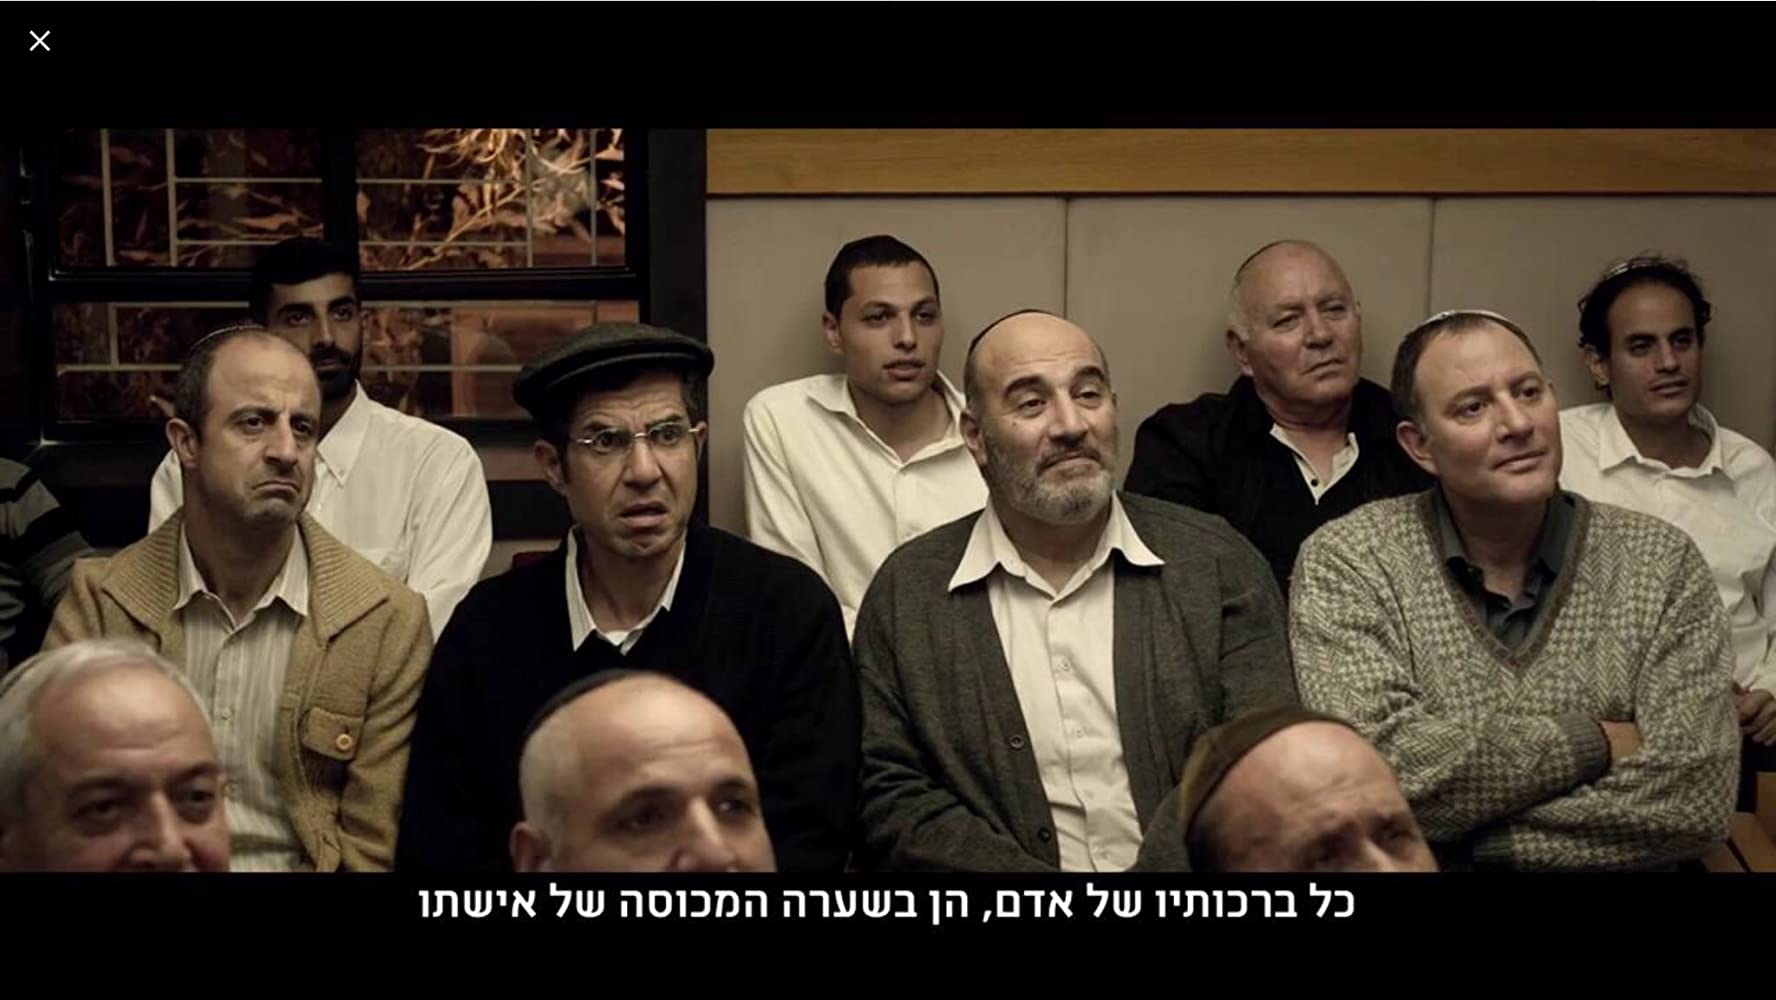 Itzik Cohen, Igal Naor, Haim Zanati, and Herzl Tobey in Ismach Hatani (2016)